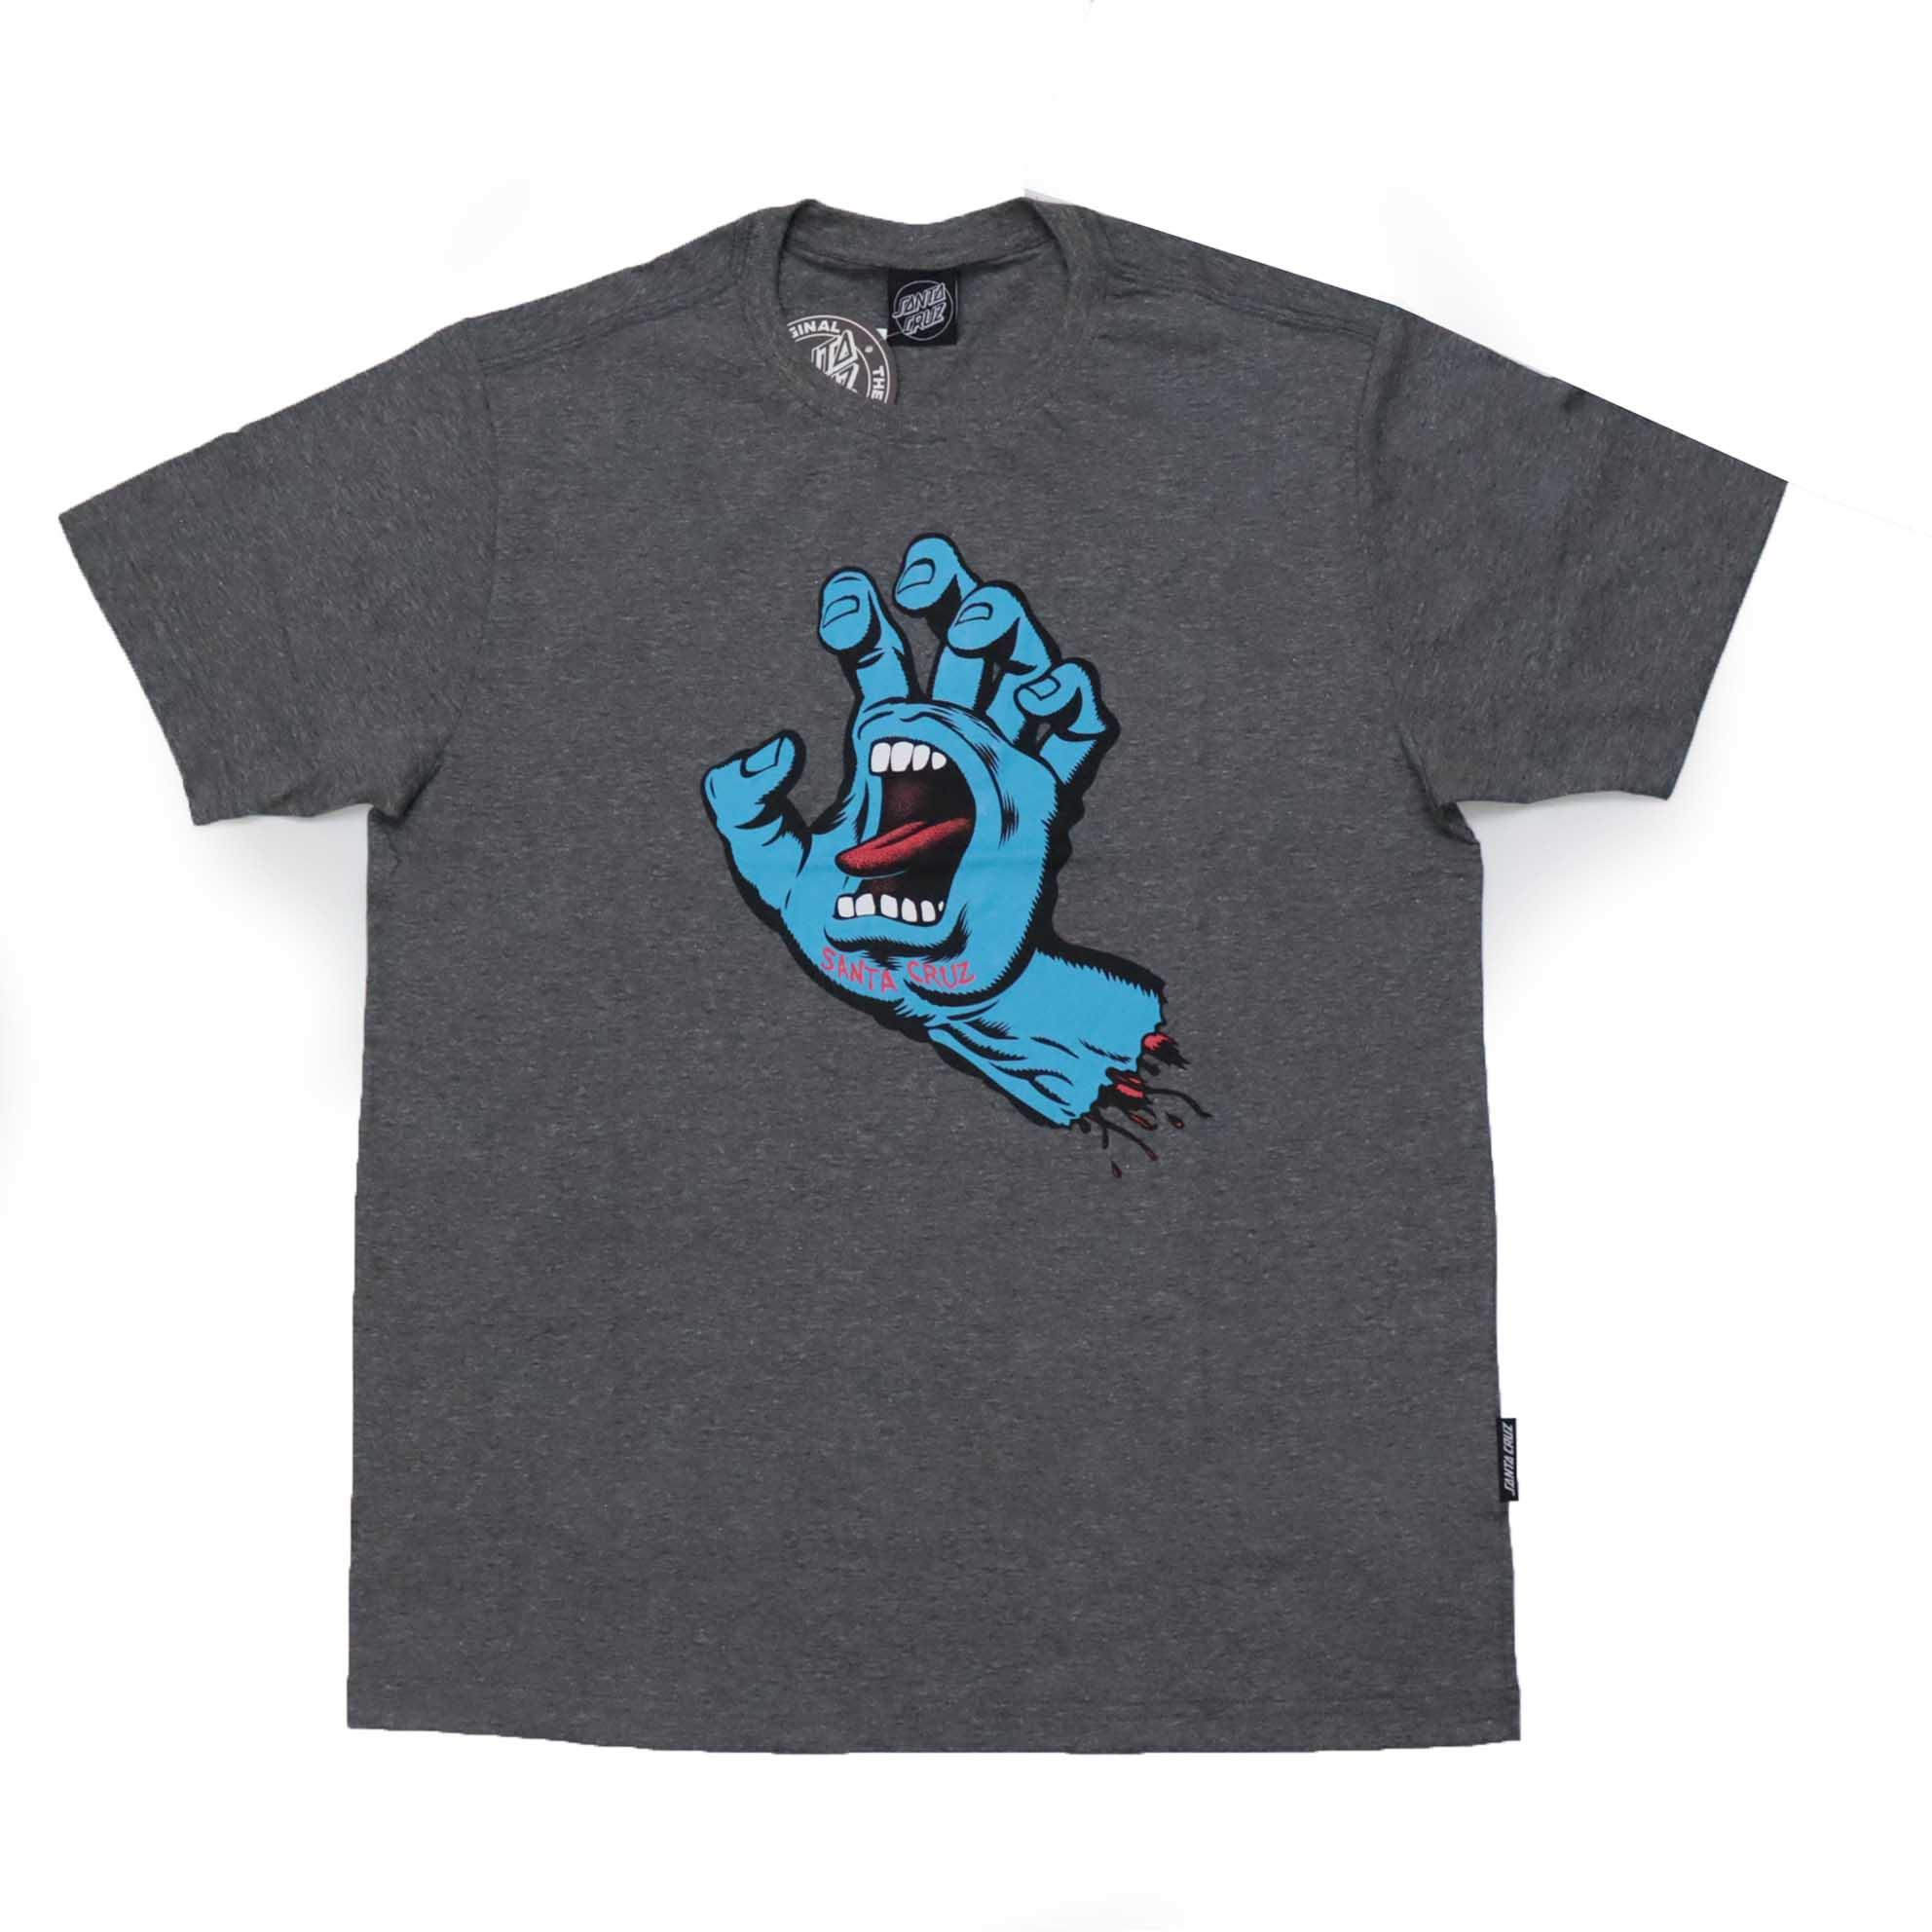 Camiseta Santa Cruz  Screaming Hand - Chumbo Mescla/Azul